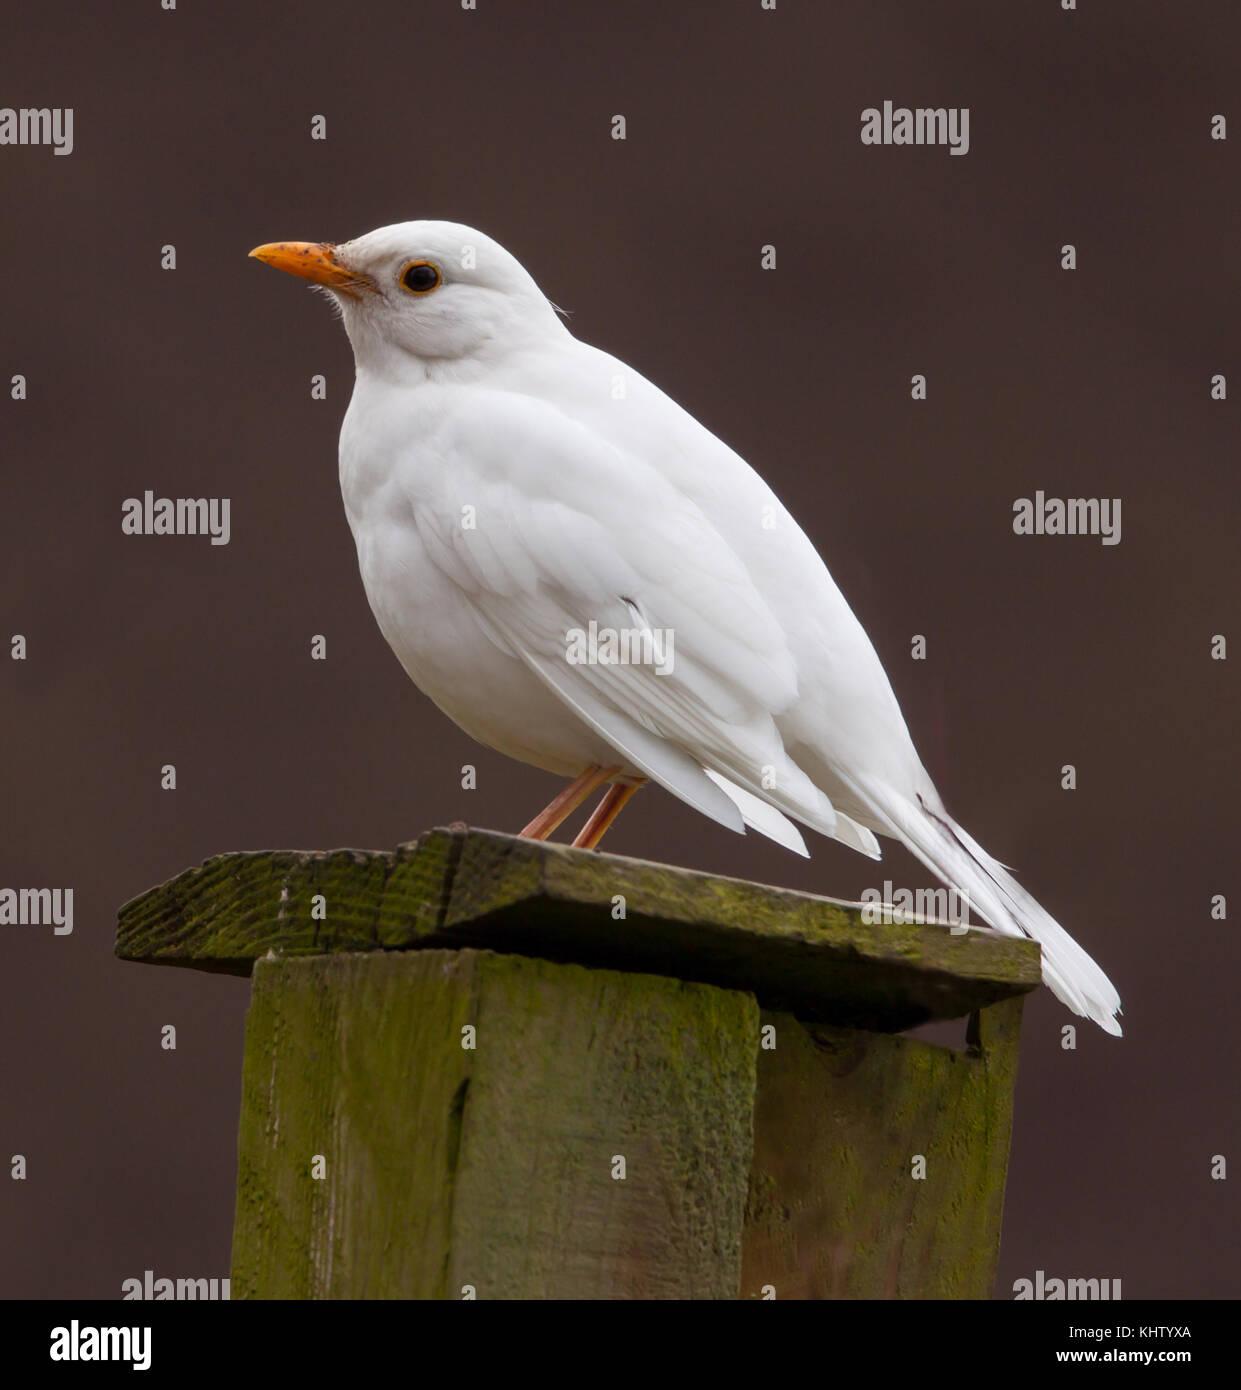 White albino blackbird Stock Photo